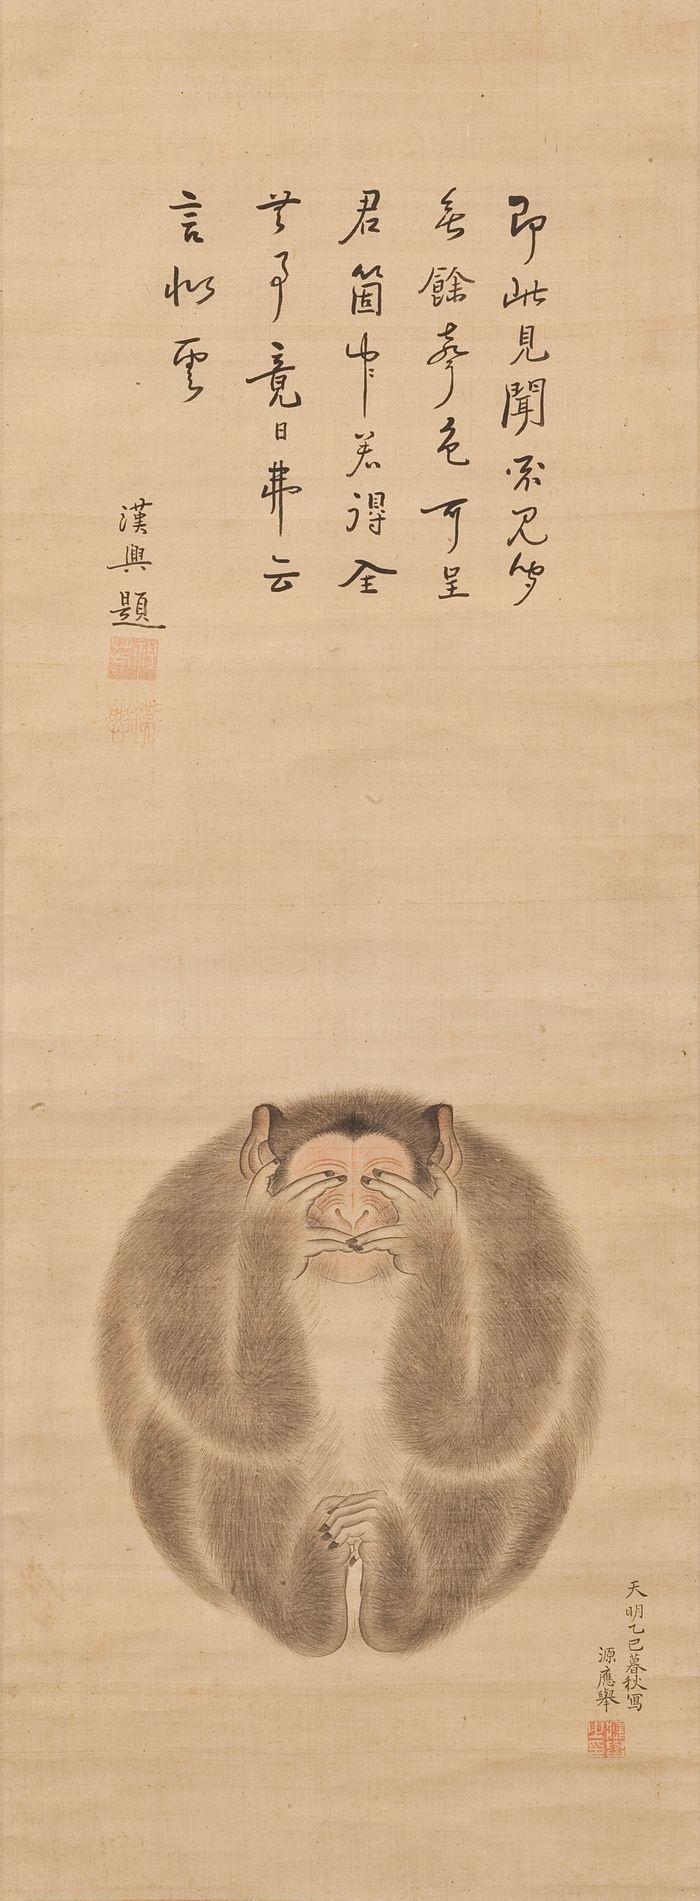 Three Monkeys, ink and color on silk by Maruyama Okyo. Calligraphy by Sozan Soho